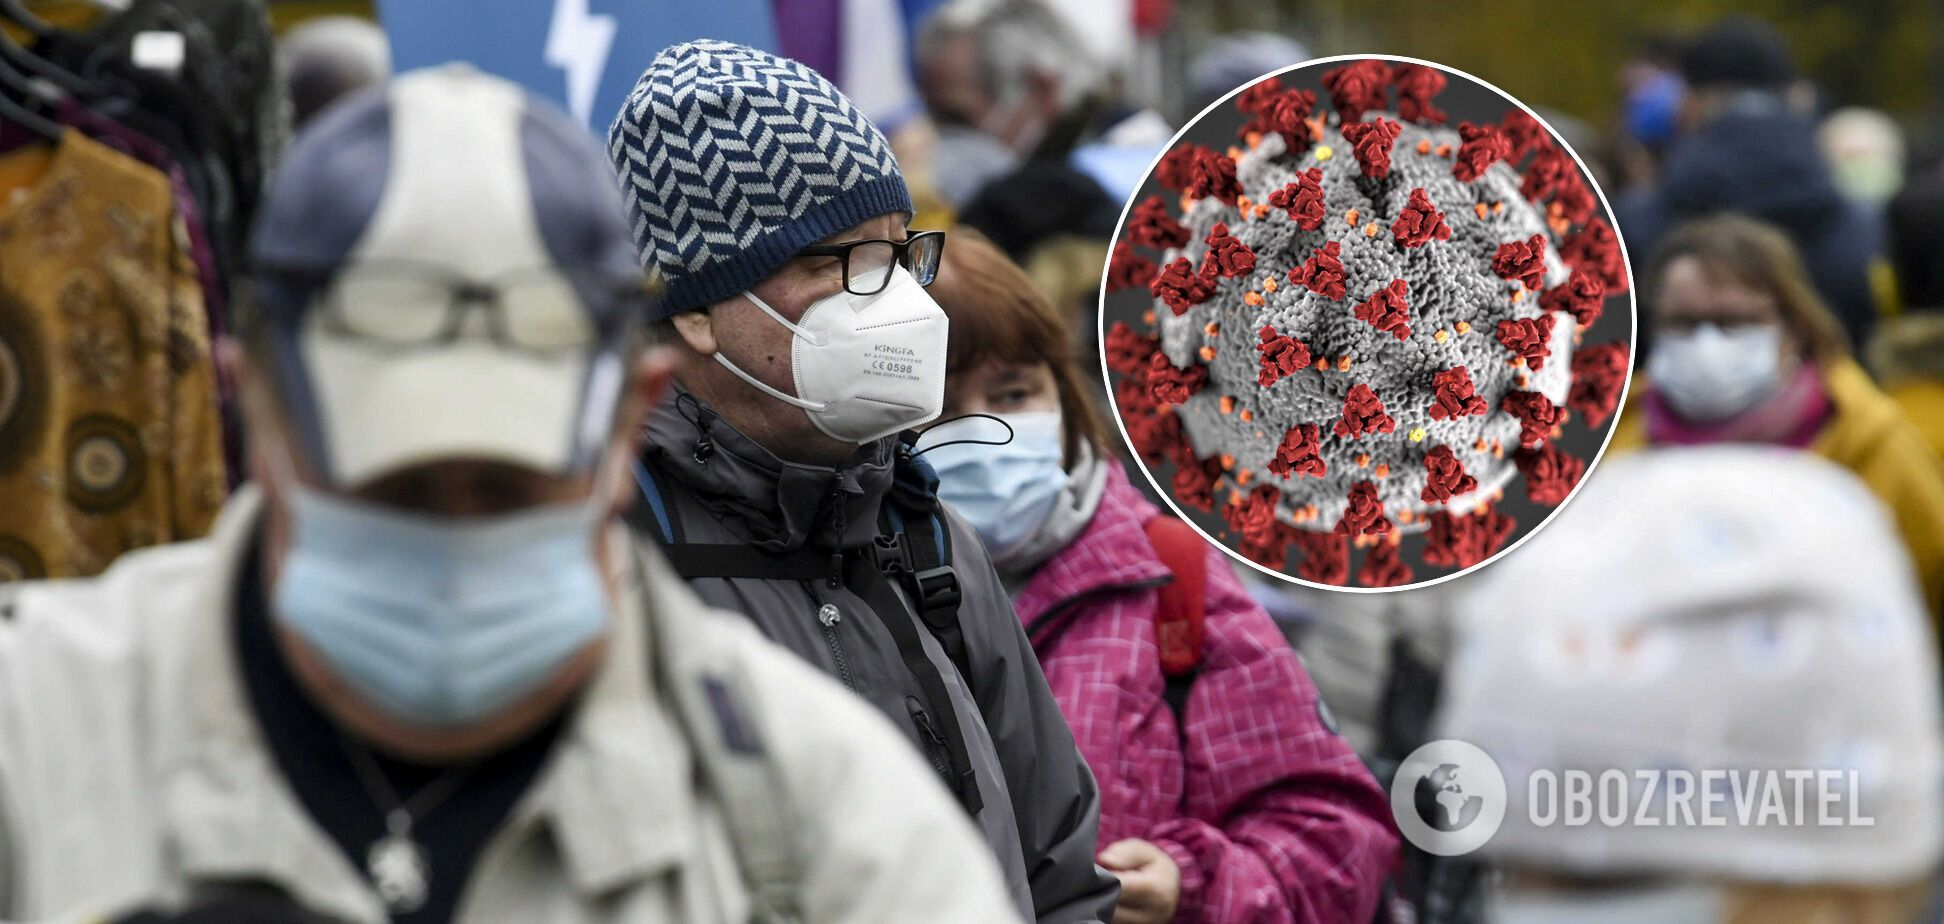 Революция в системе здравоохранения: как пандемия Covid-19 изменила медицину